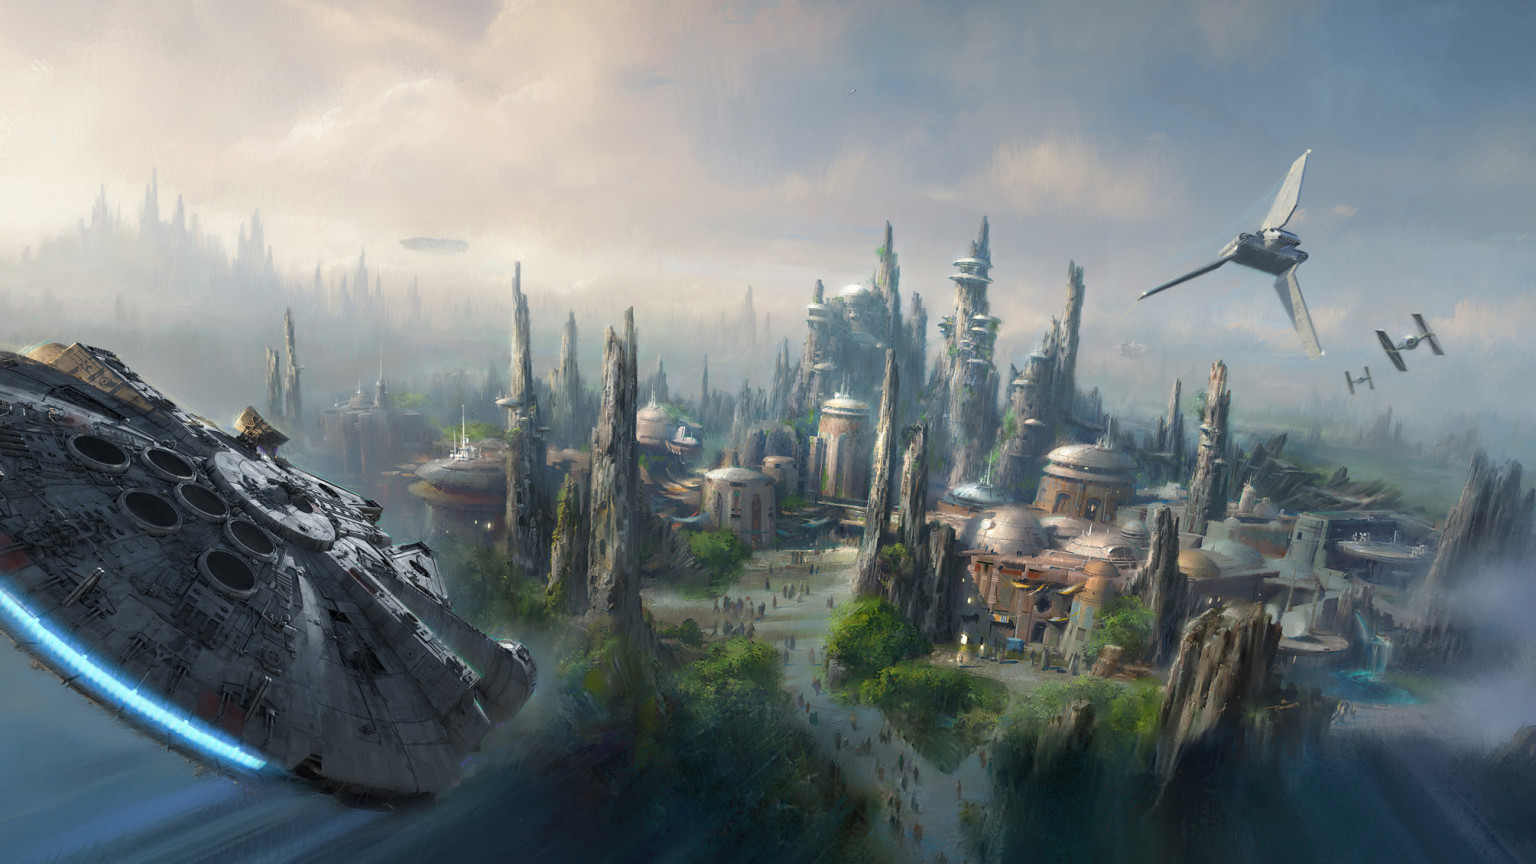 Star Wars theme park coming to Disneyland and Disneyworld